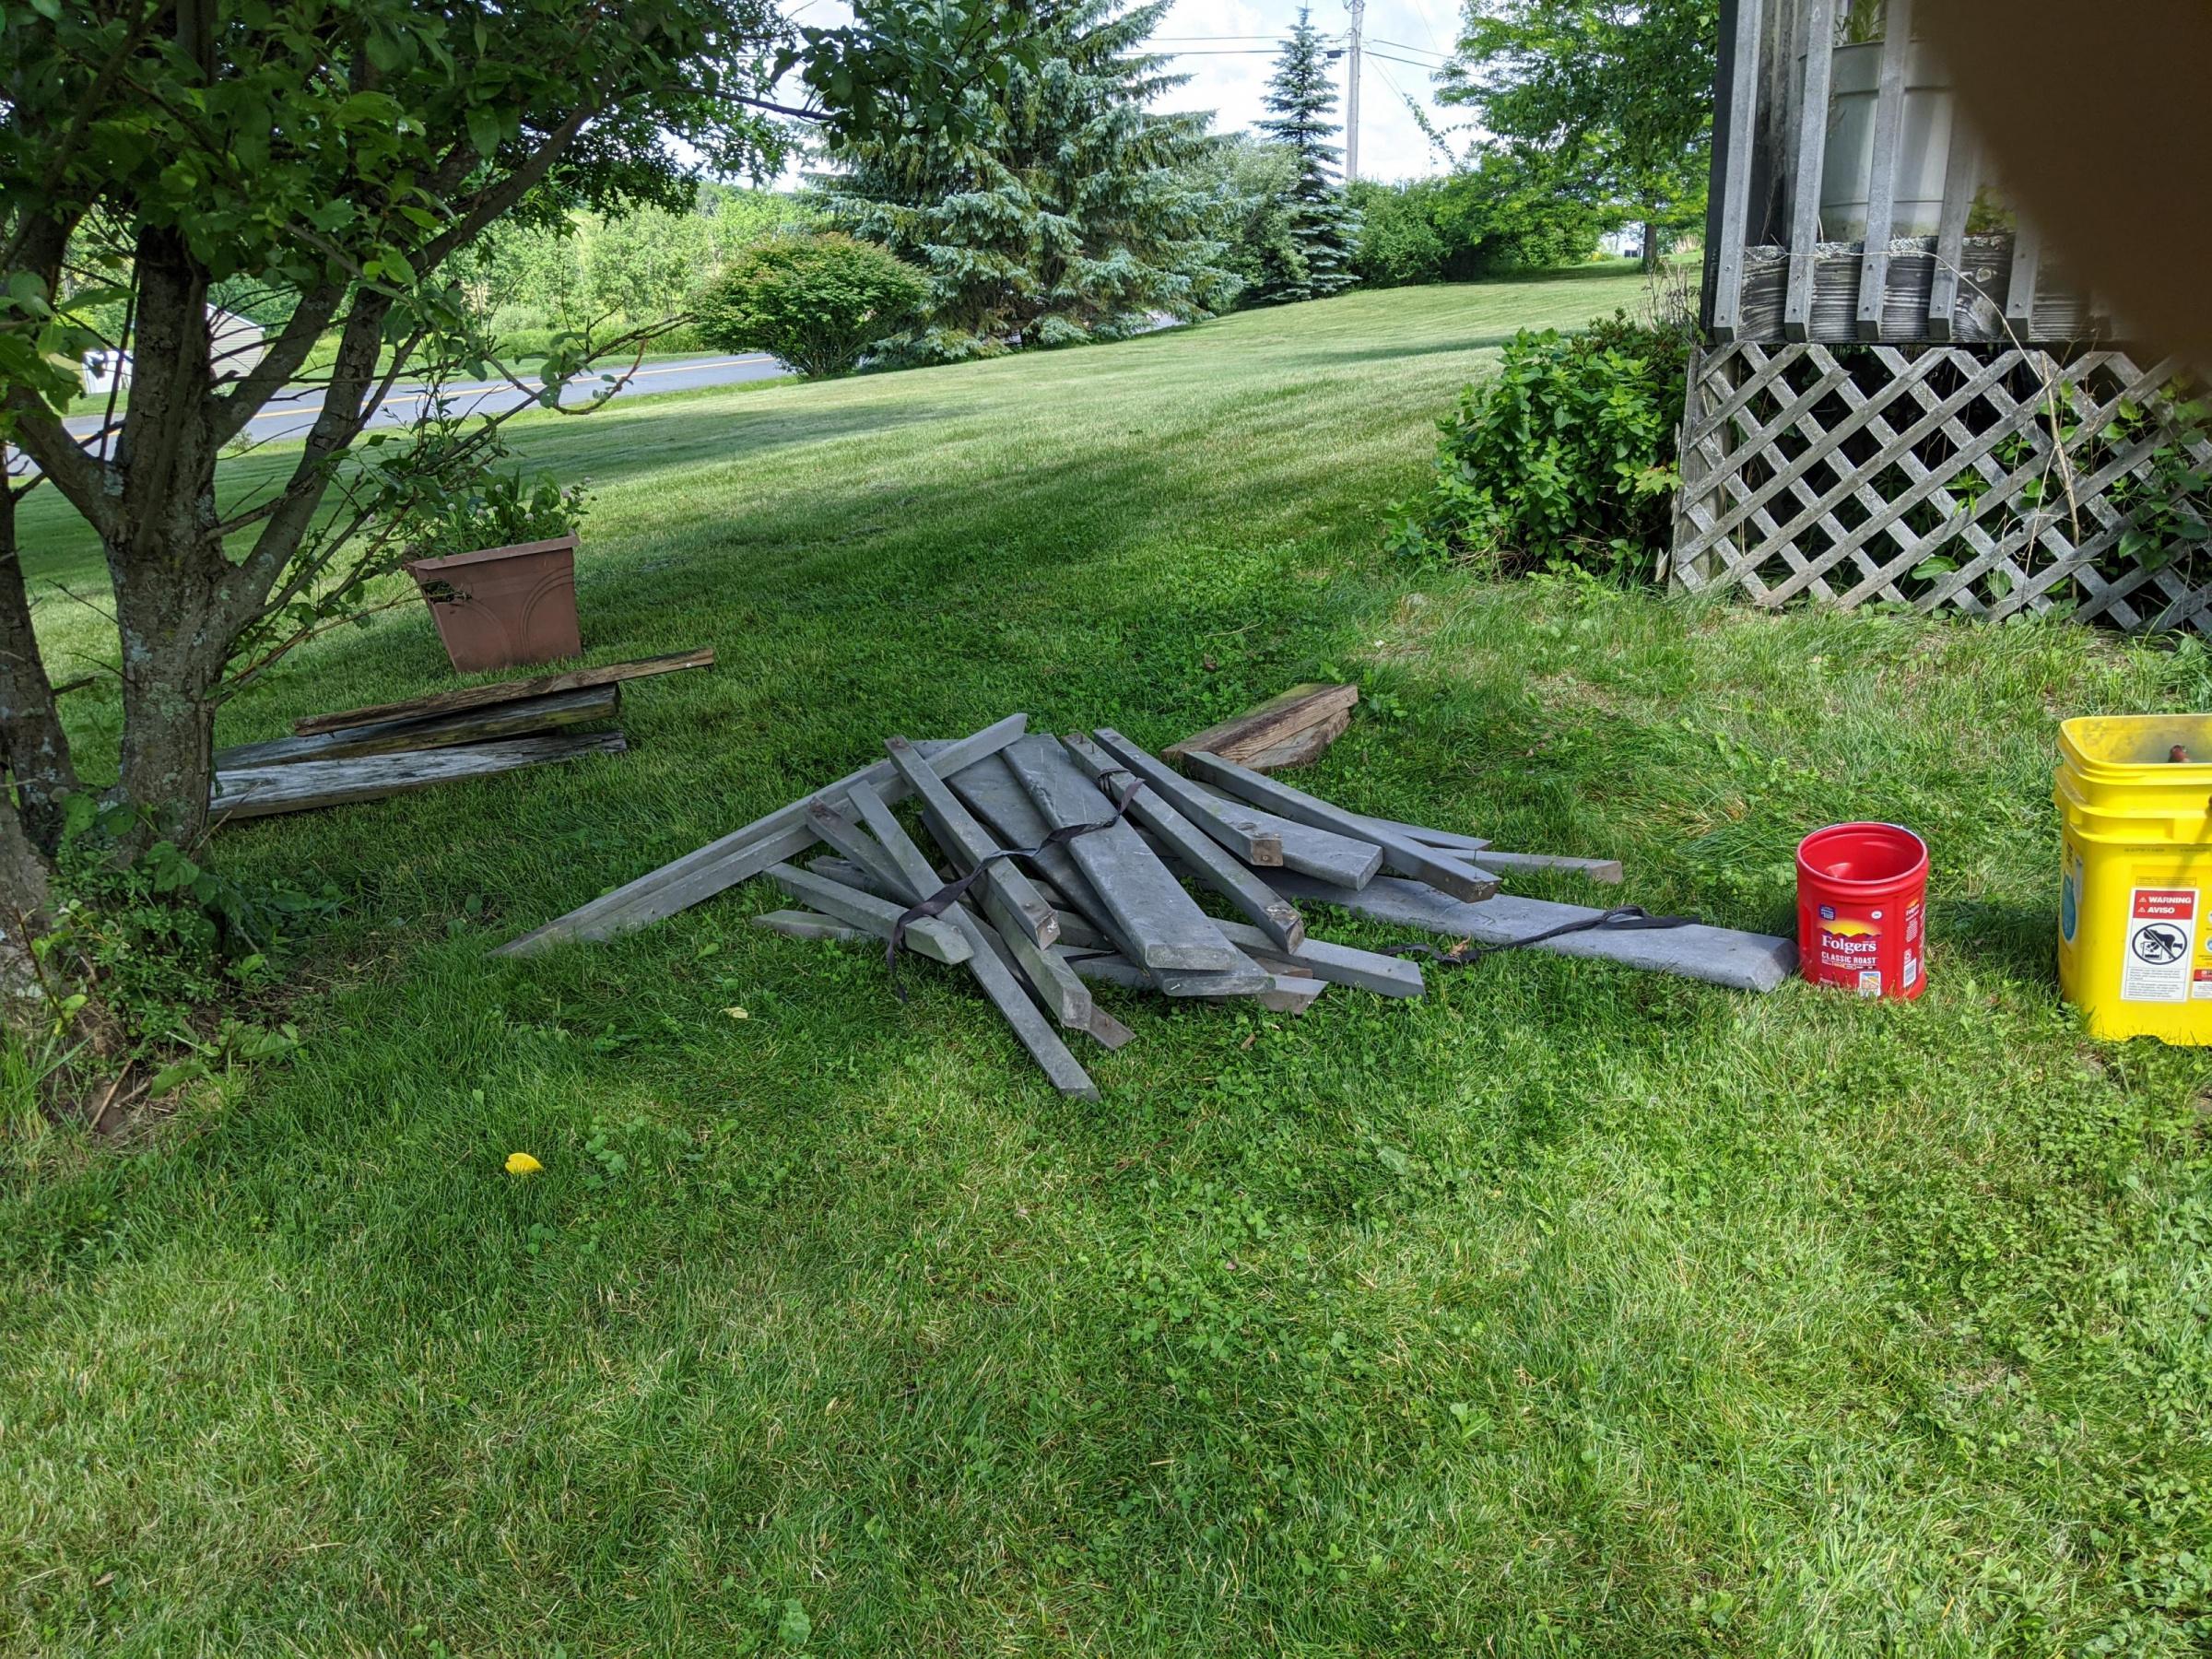 Front porch rebuild-img_20200629_104908_1593443582829.jpg